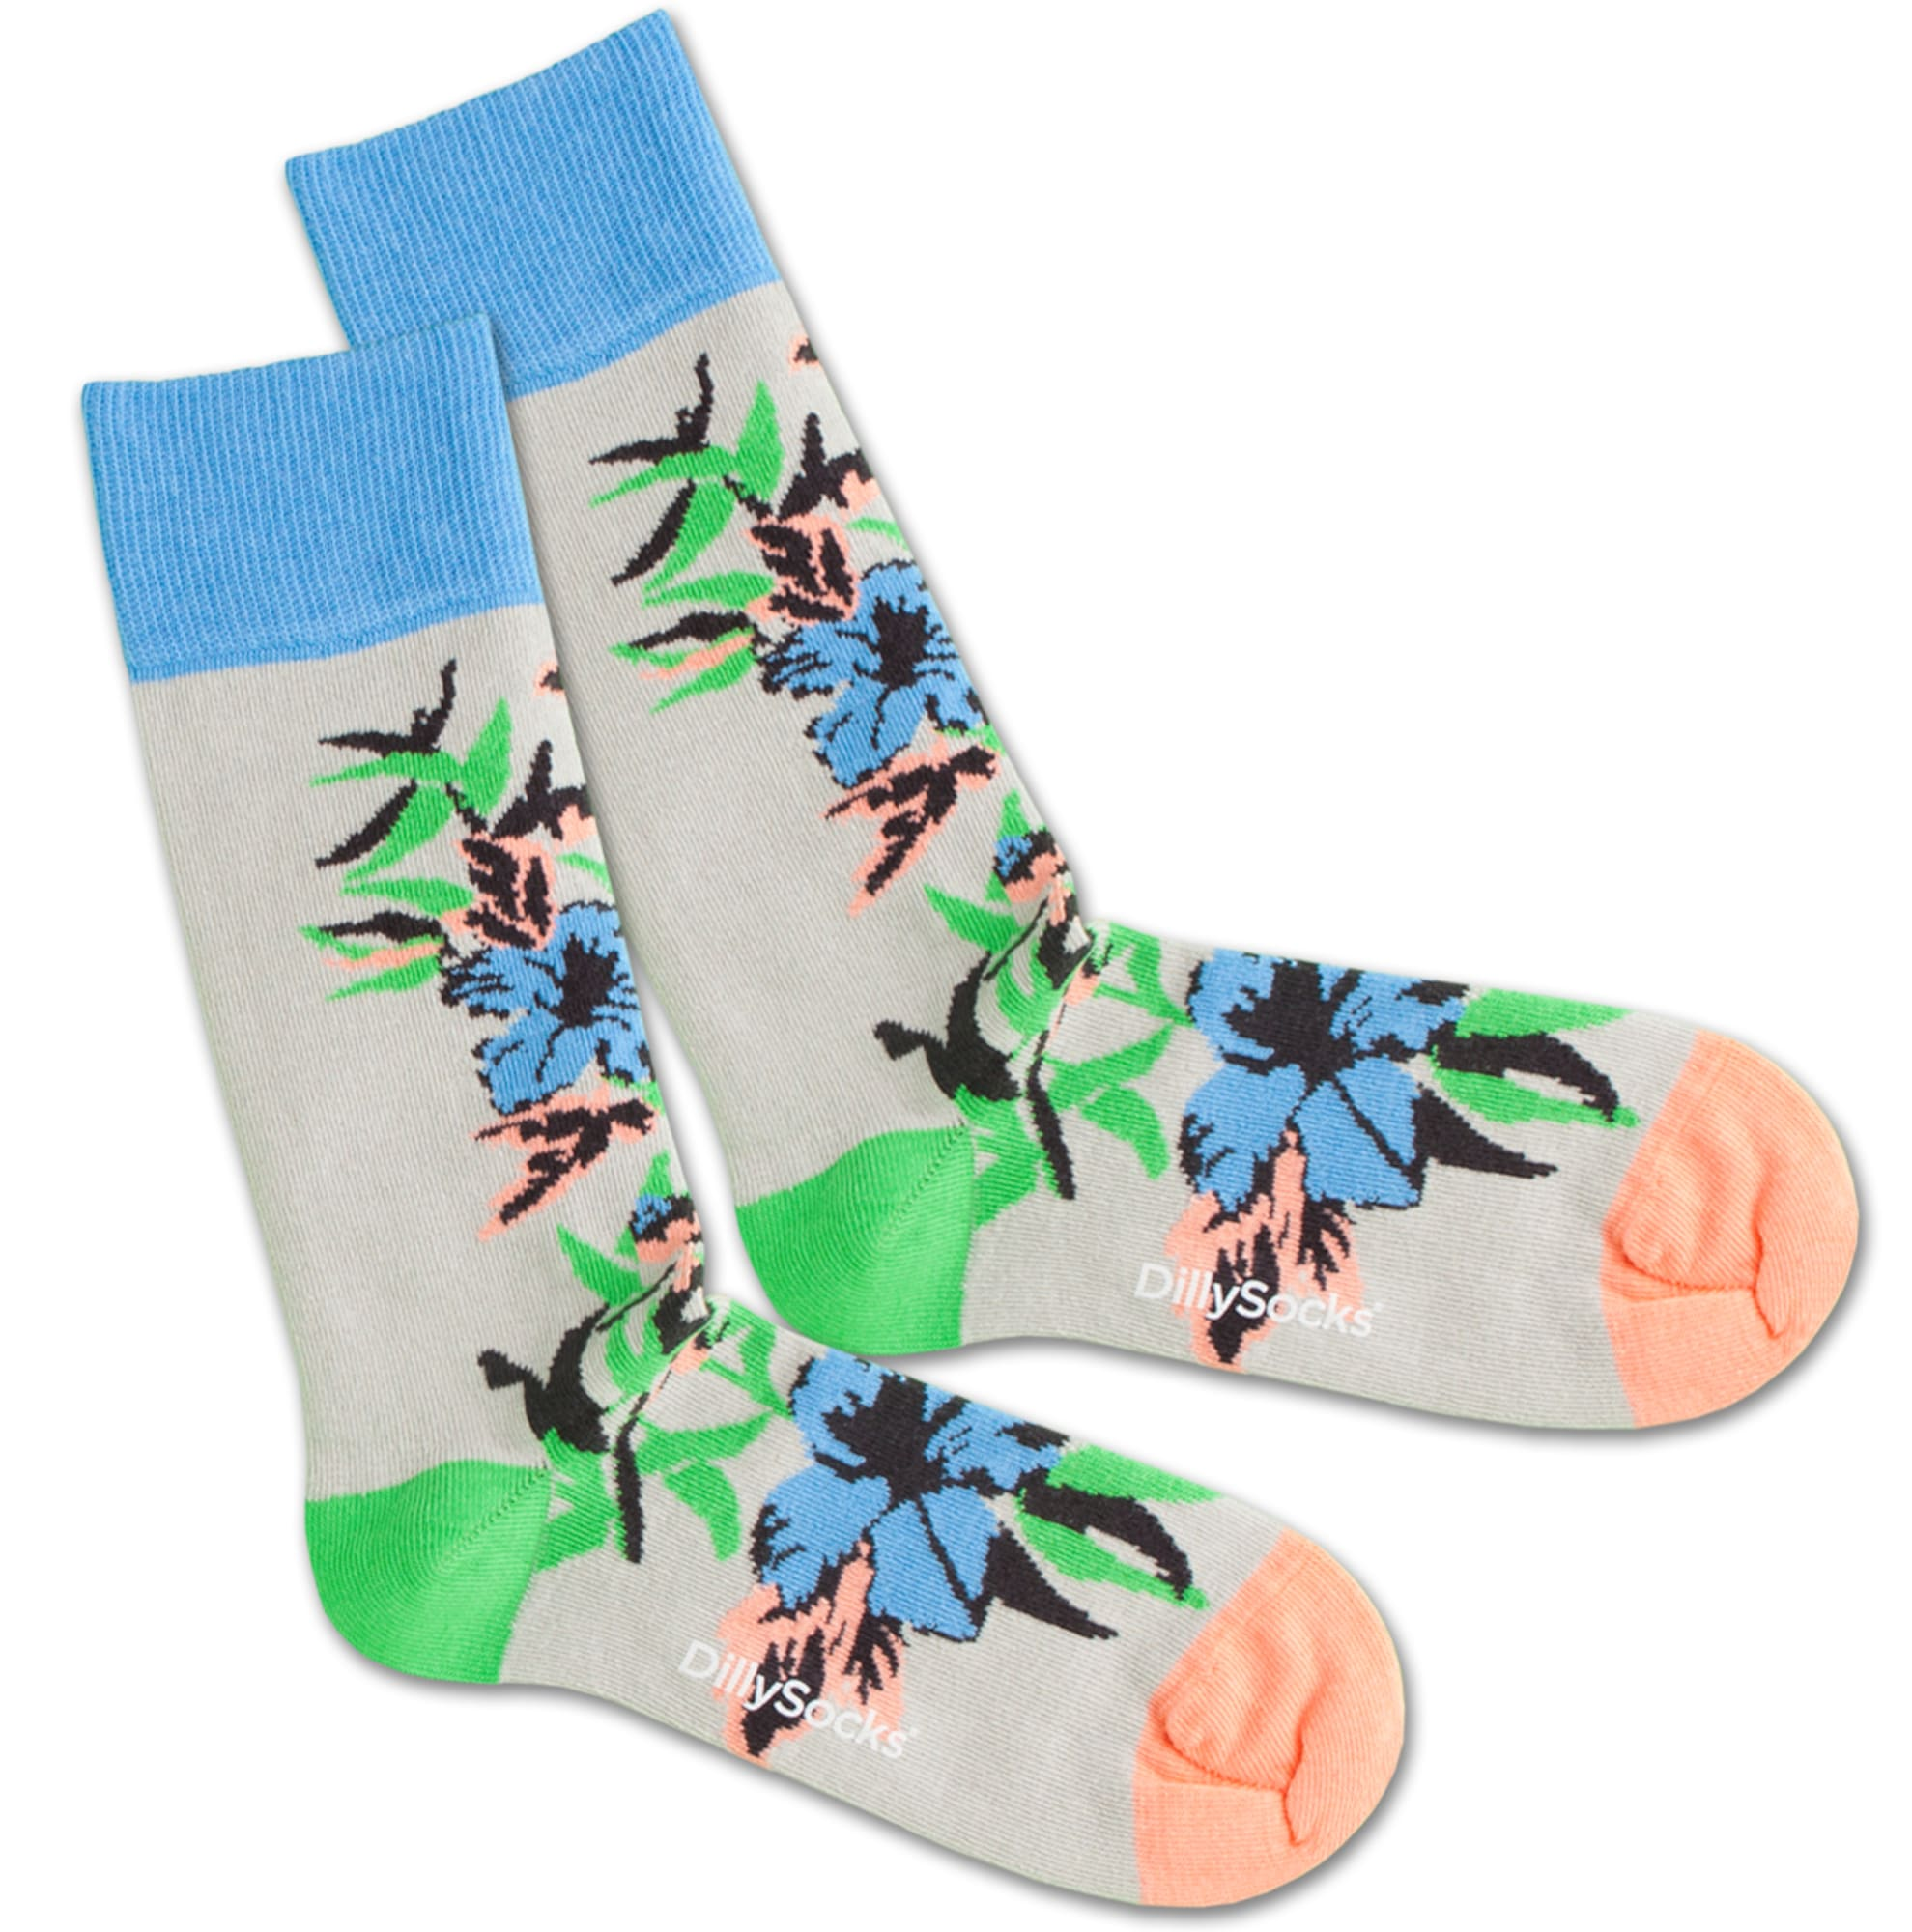 Ponožky Old Flower modrá šedá DillySocks